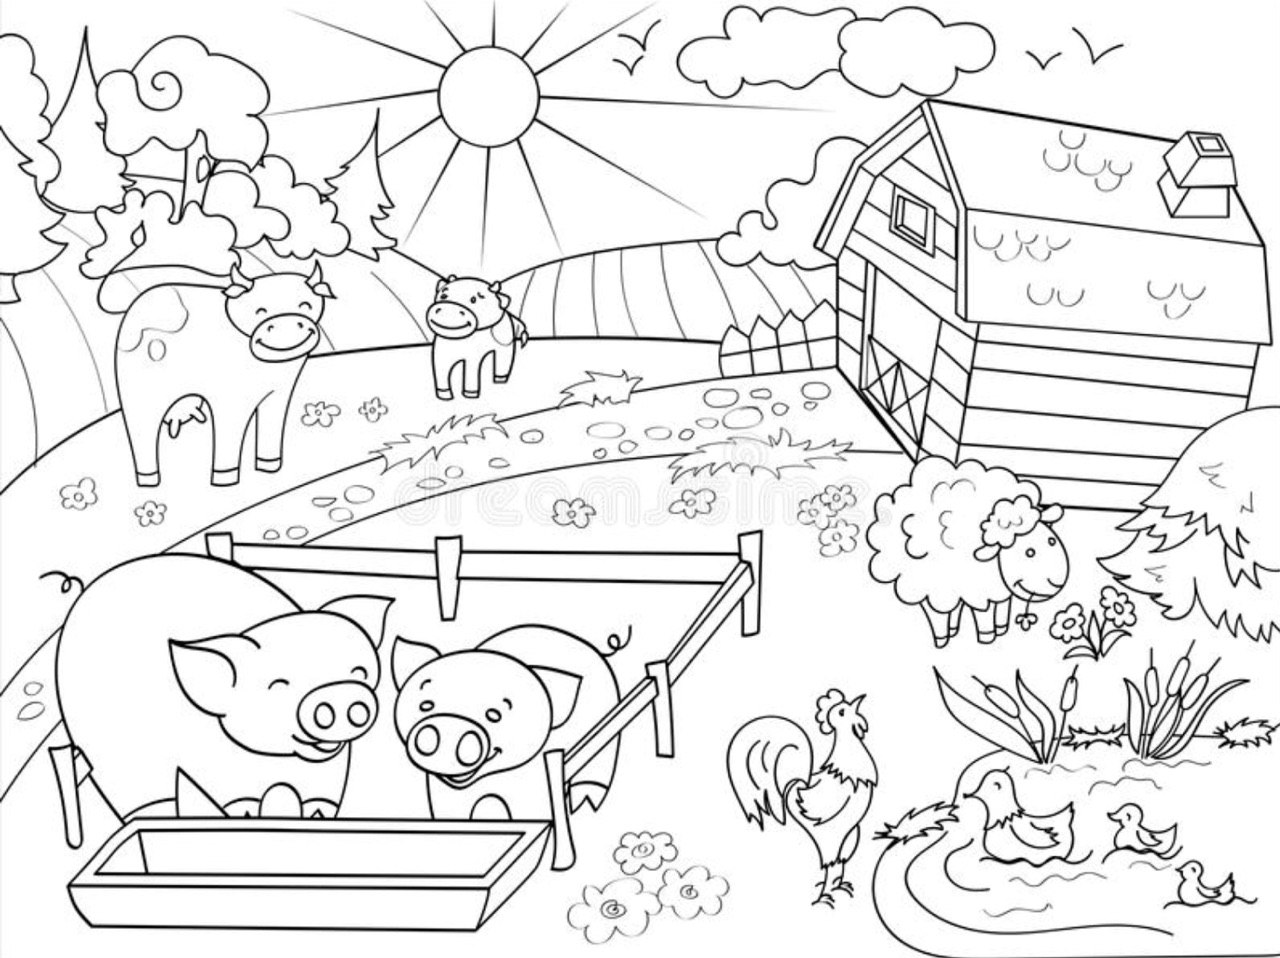 пример картинки для рисованого крокодила